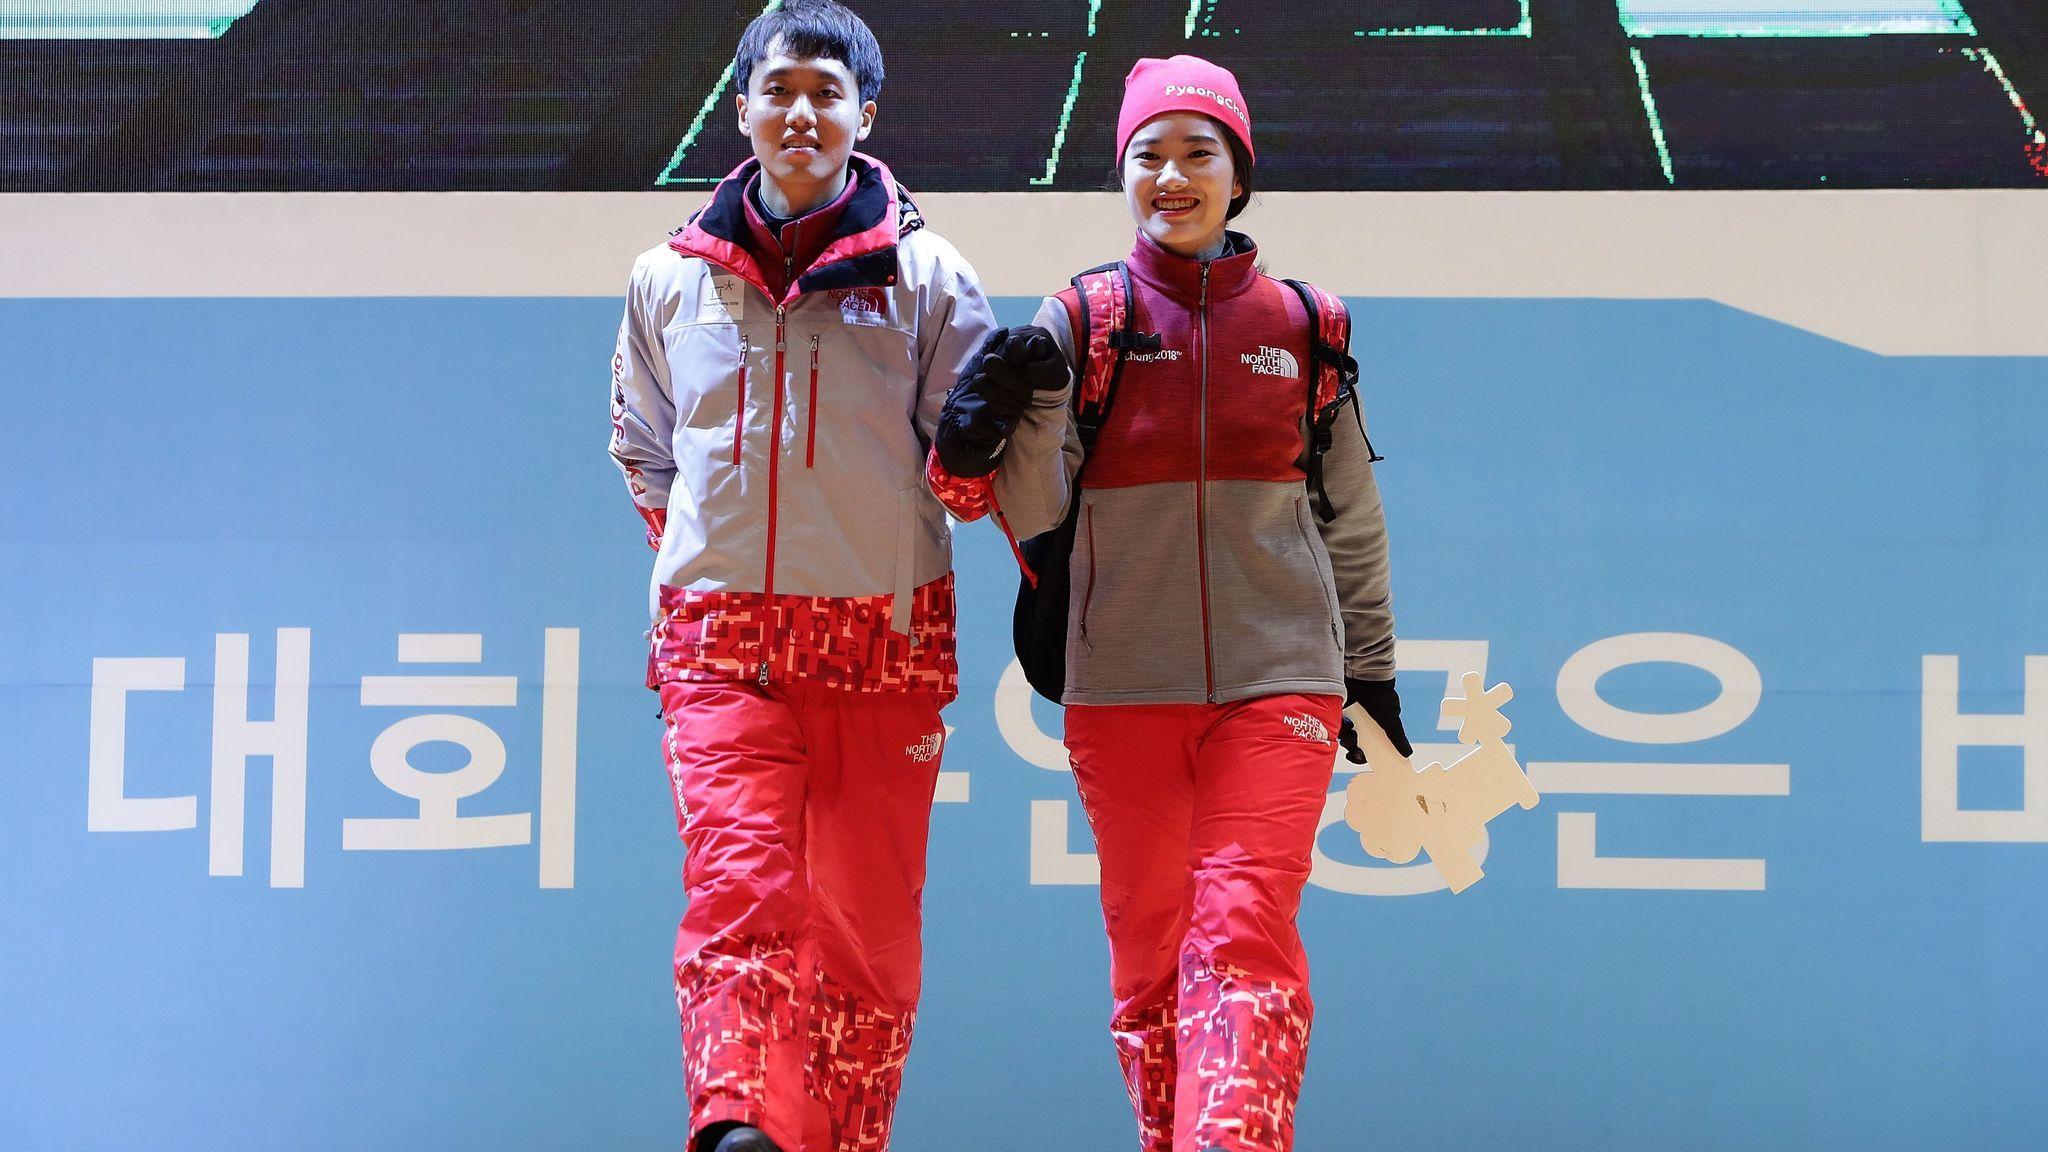 PyeongChang 2018 uniform unveiling